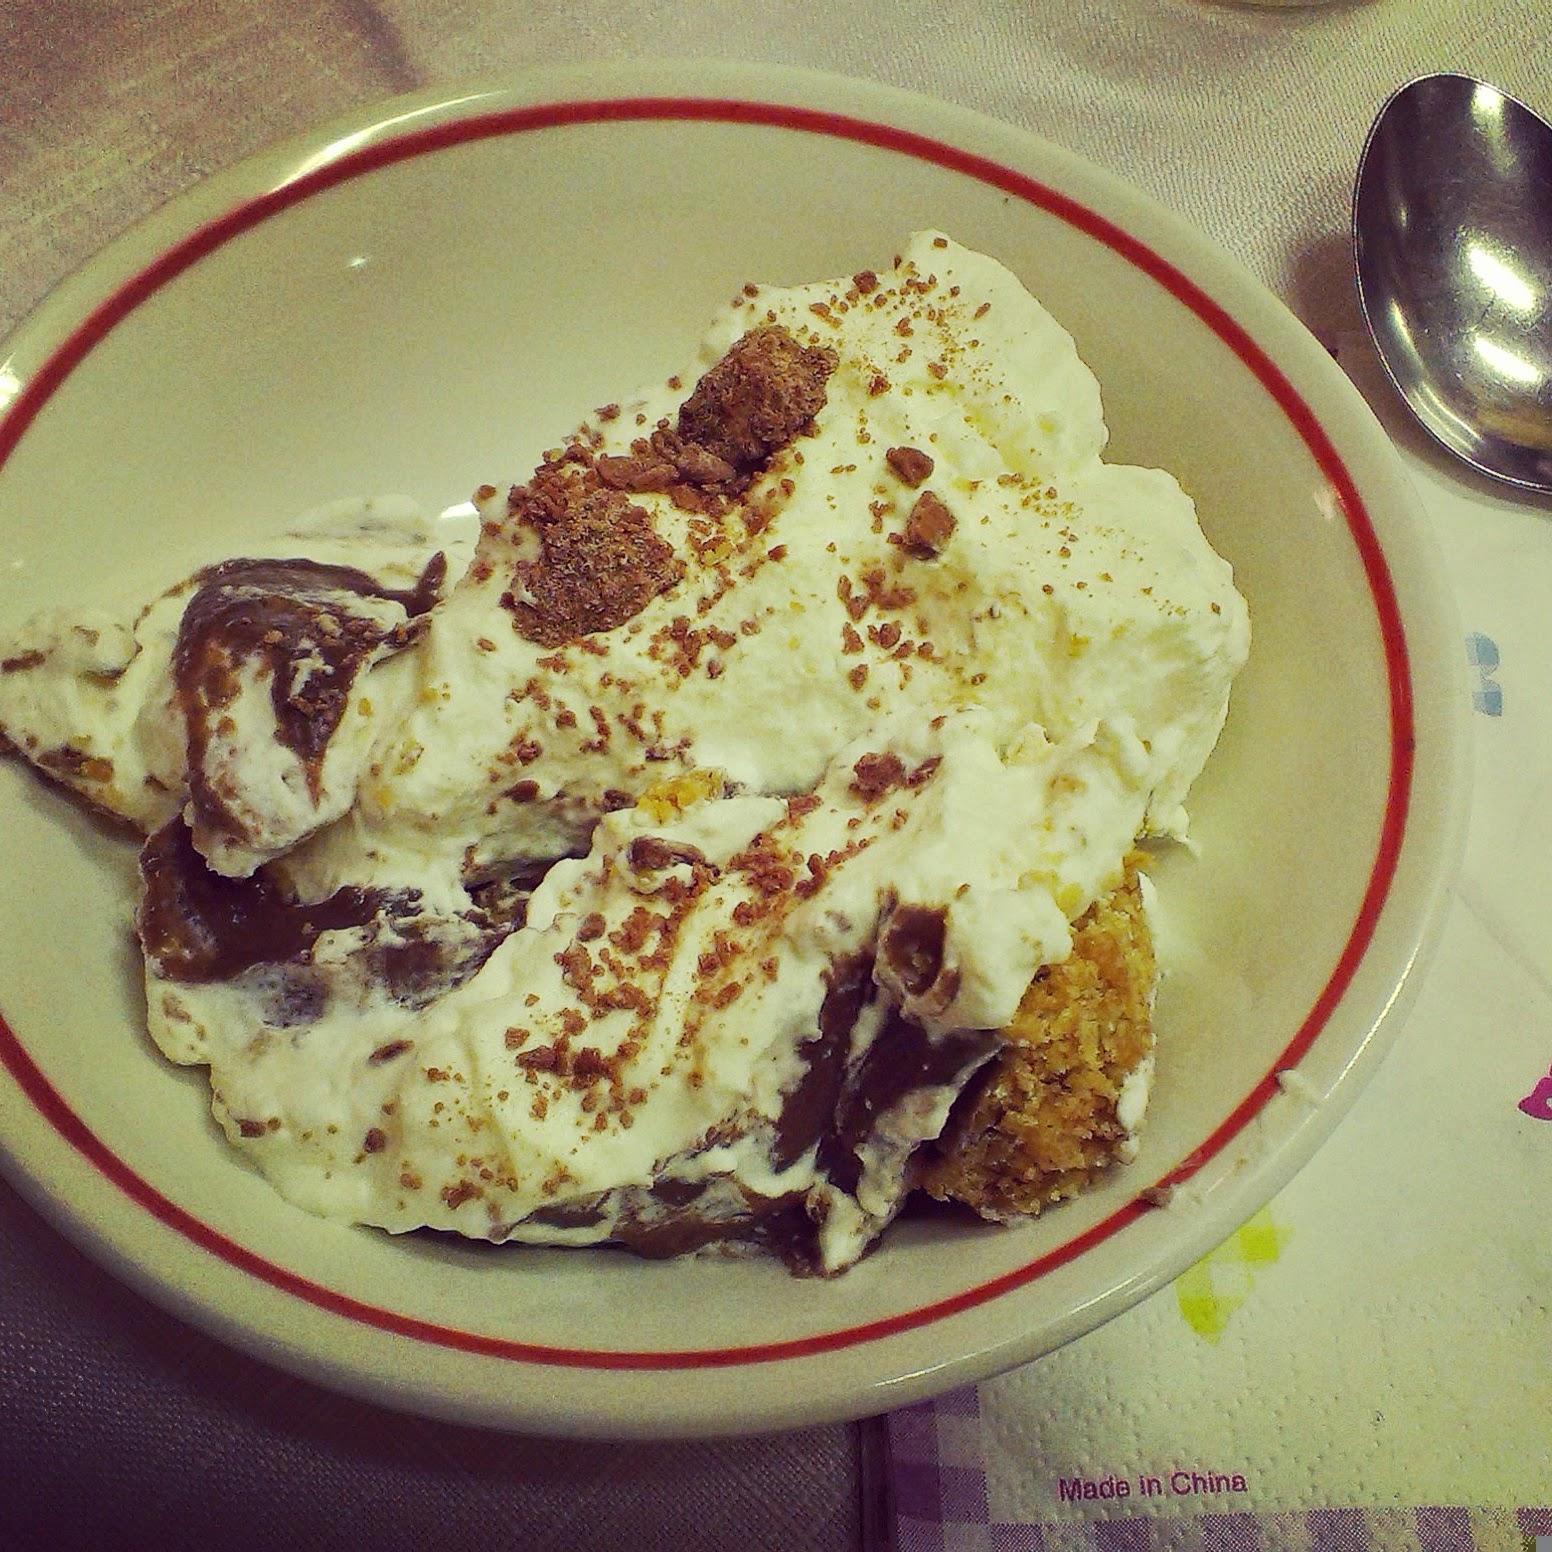 8pm - banoffee pie and chocolate cream pie